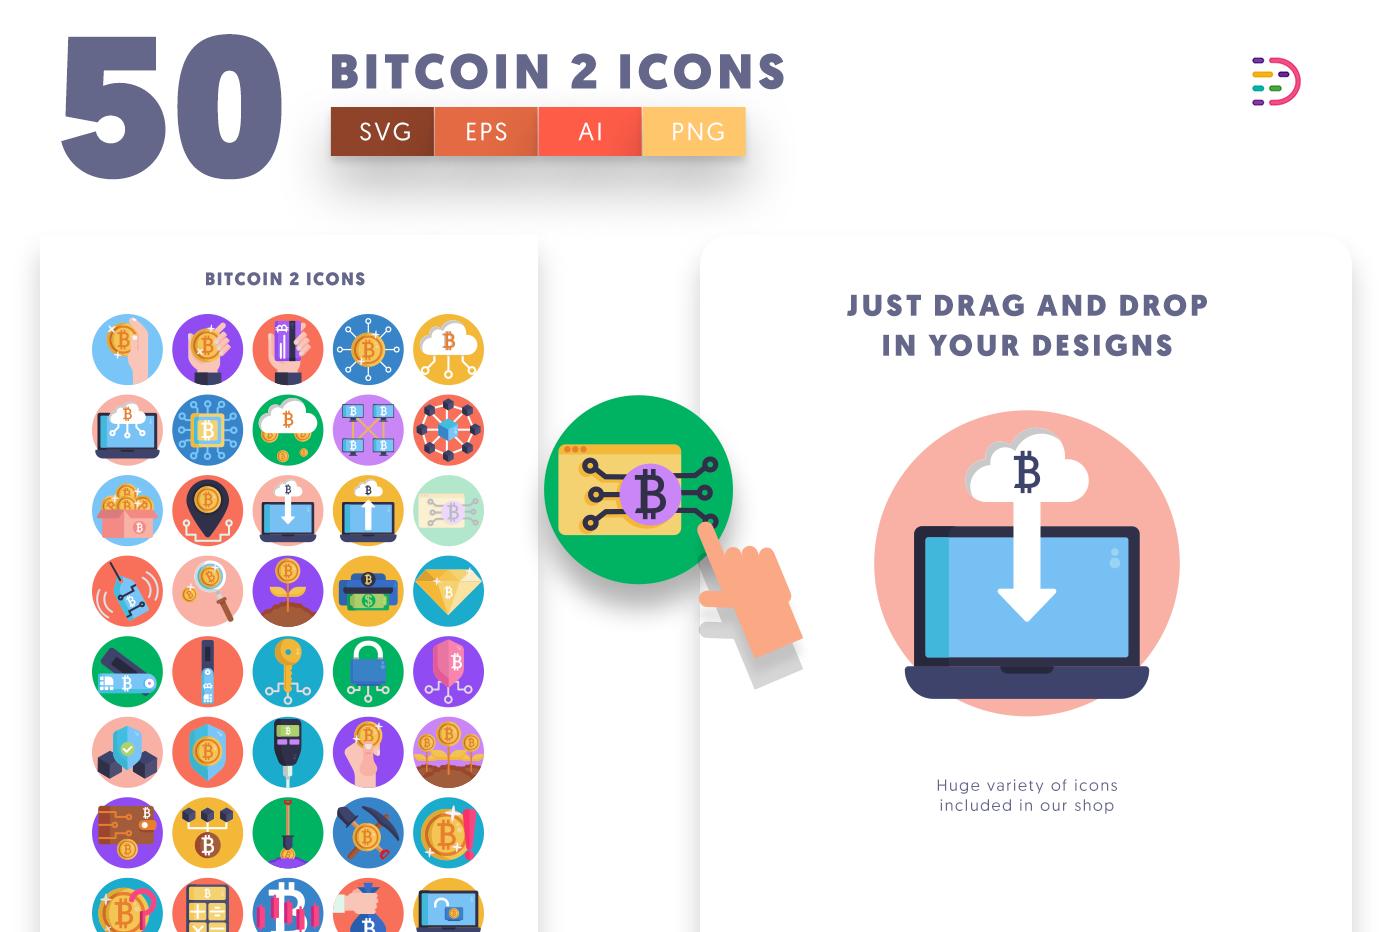 Drag and drop vector 50 Bitcoin 2 Icons